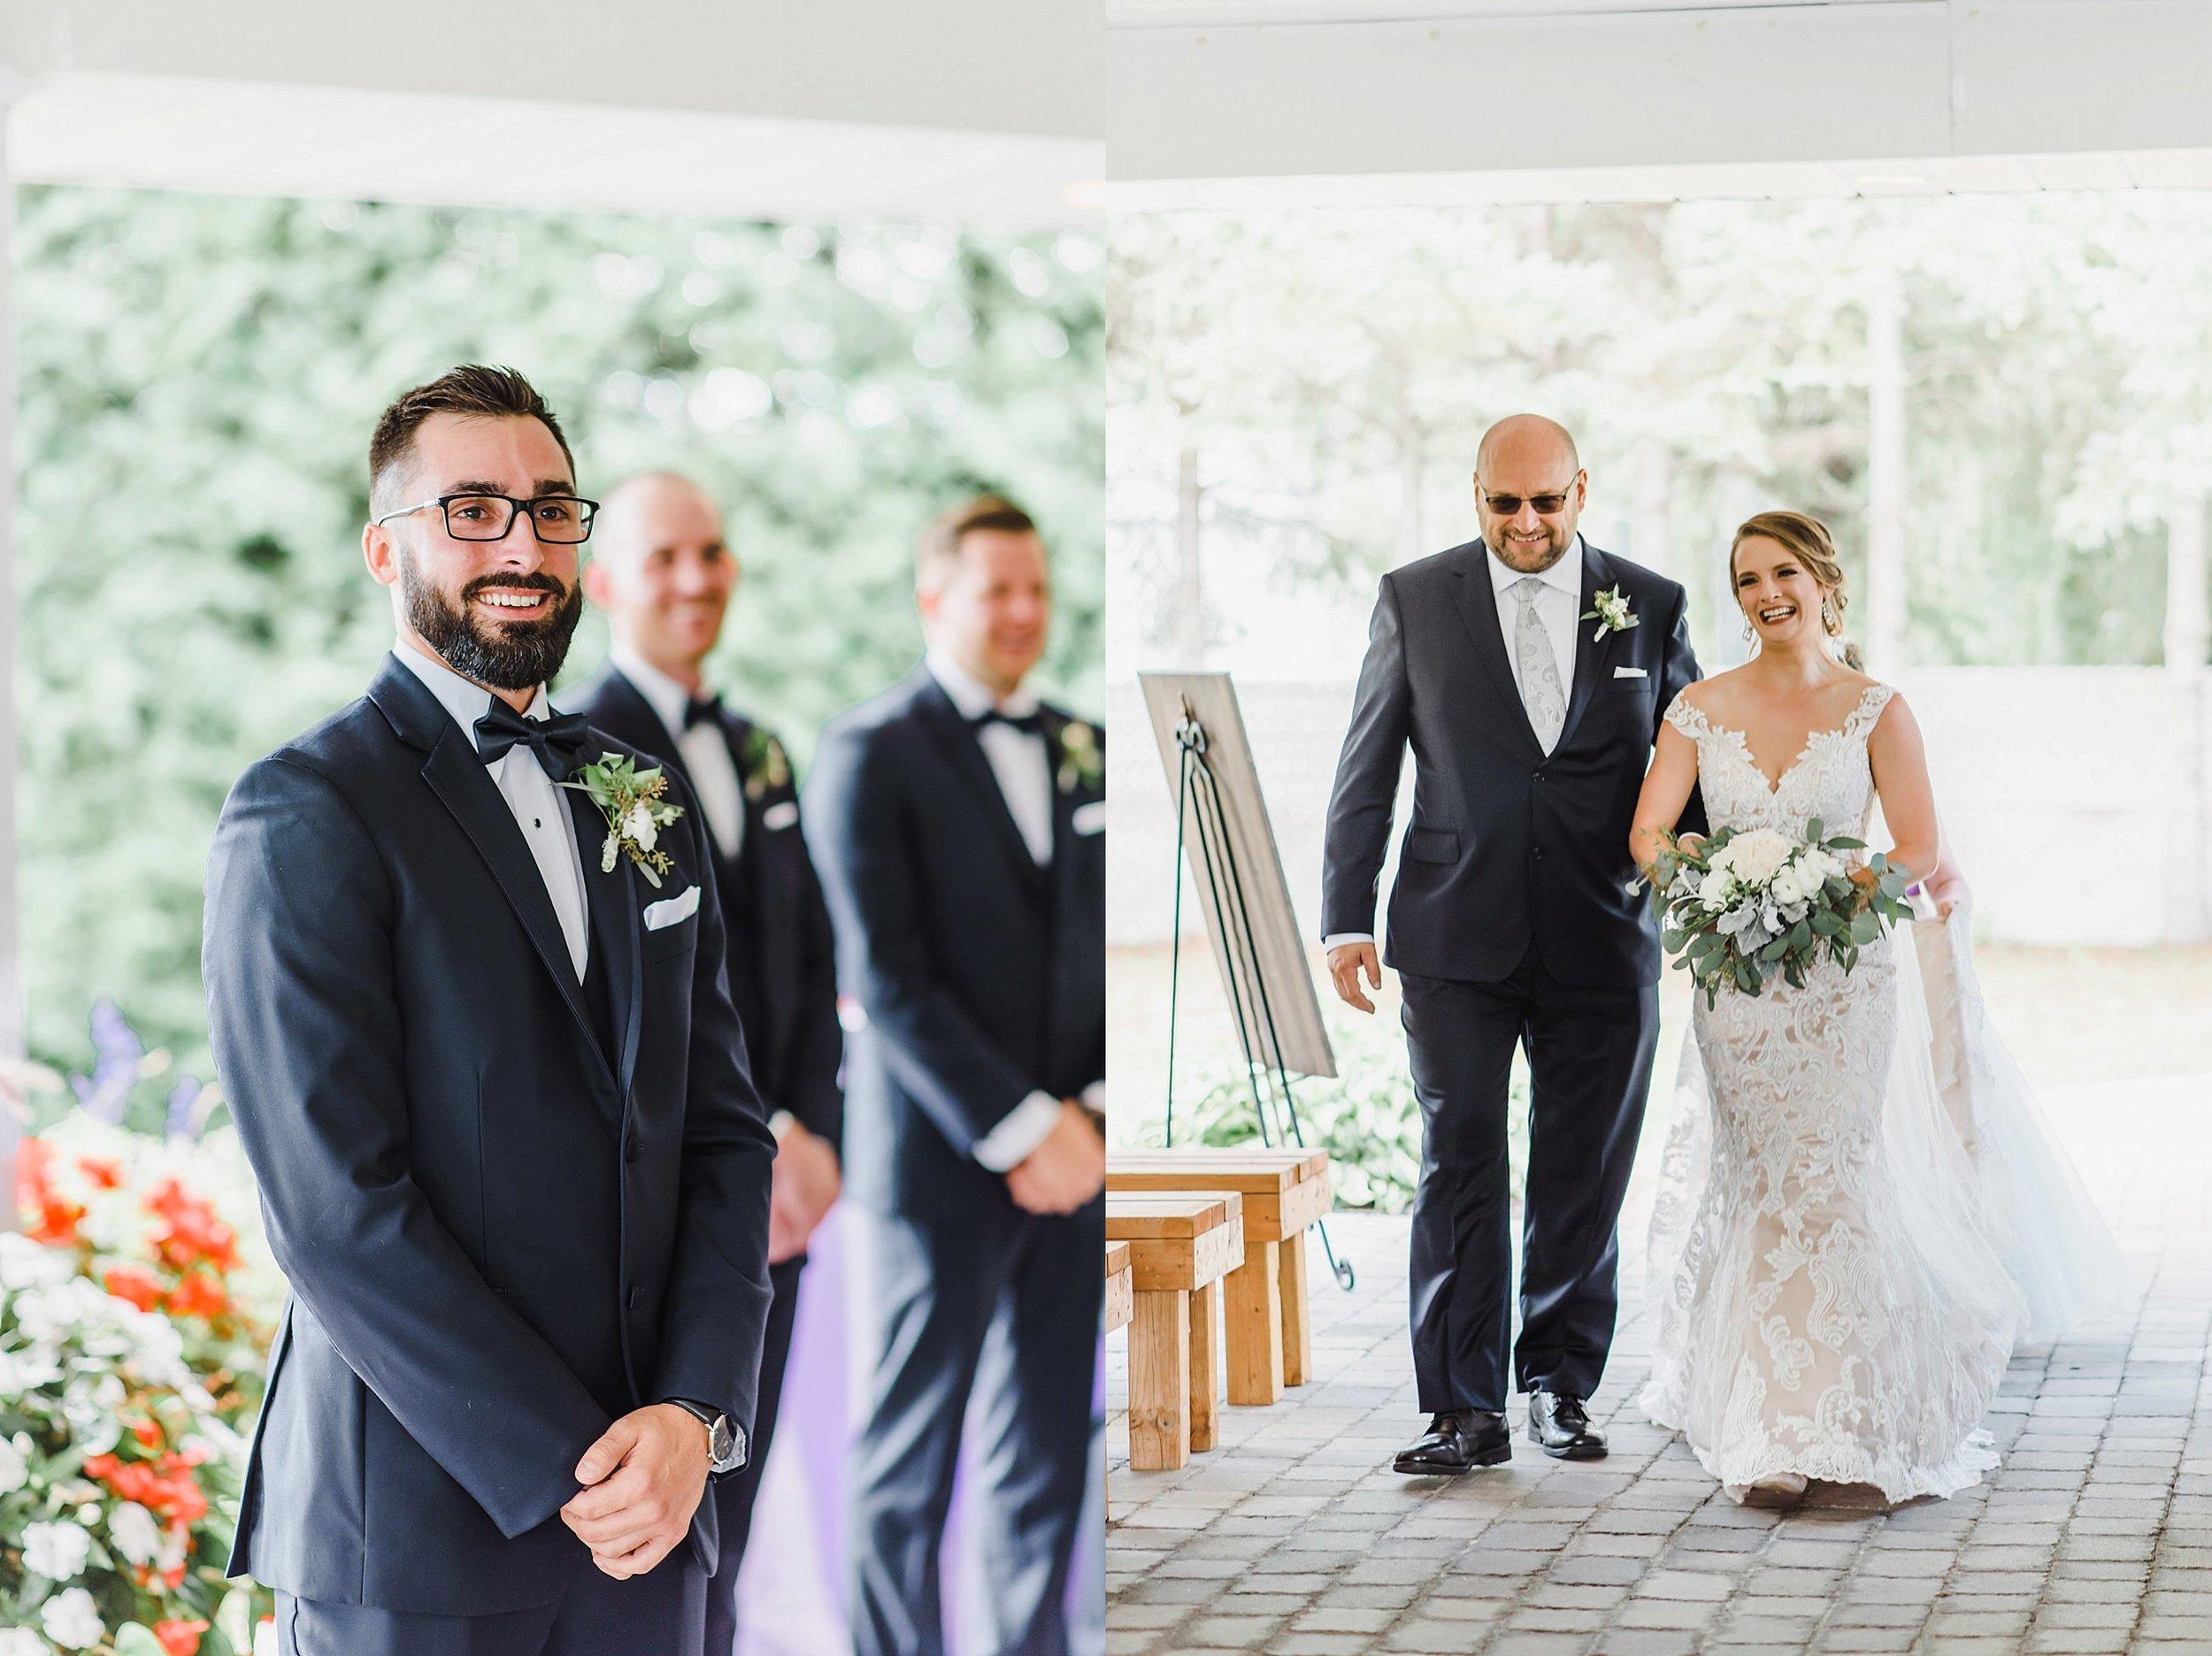 light airy indie fine art ottawa wedding photographer | Ali and Batoul Photography_1266.jpg